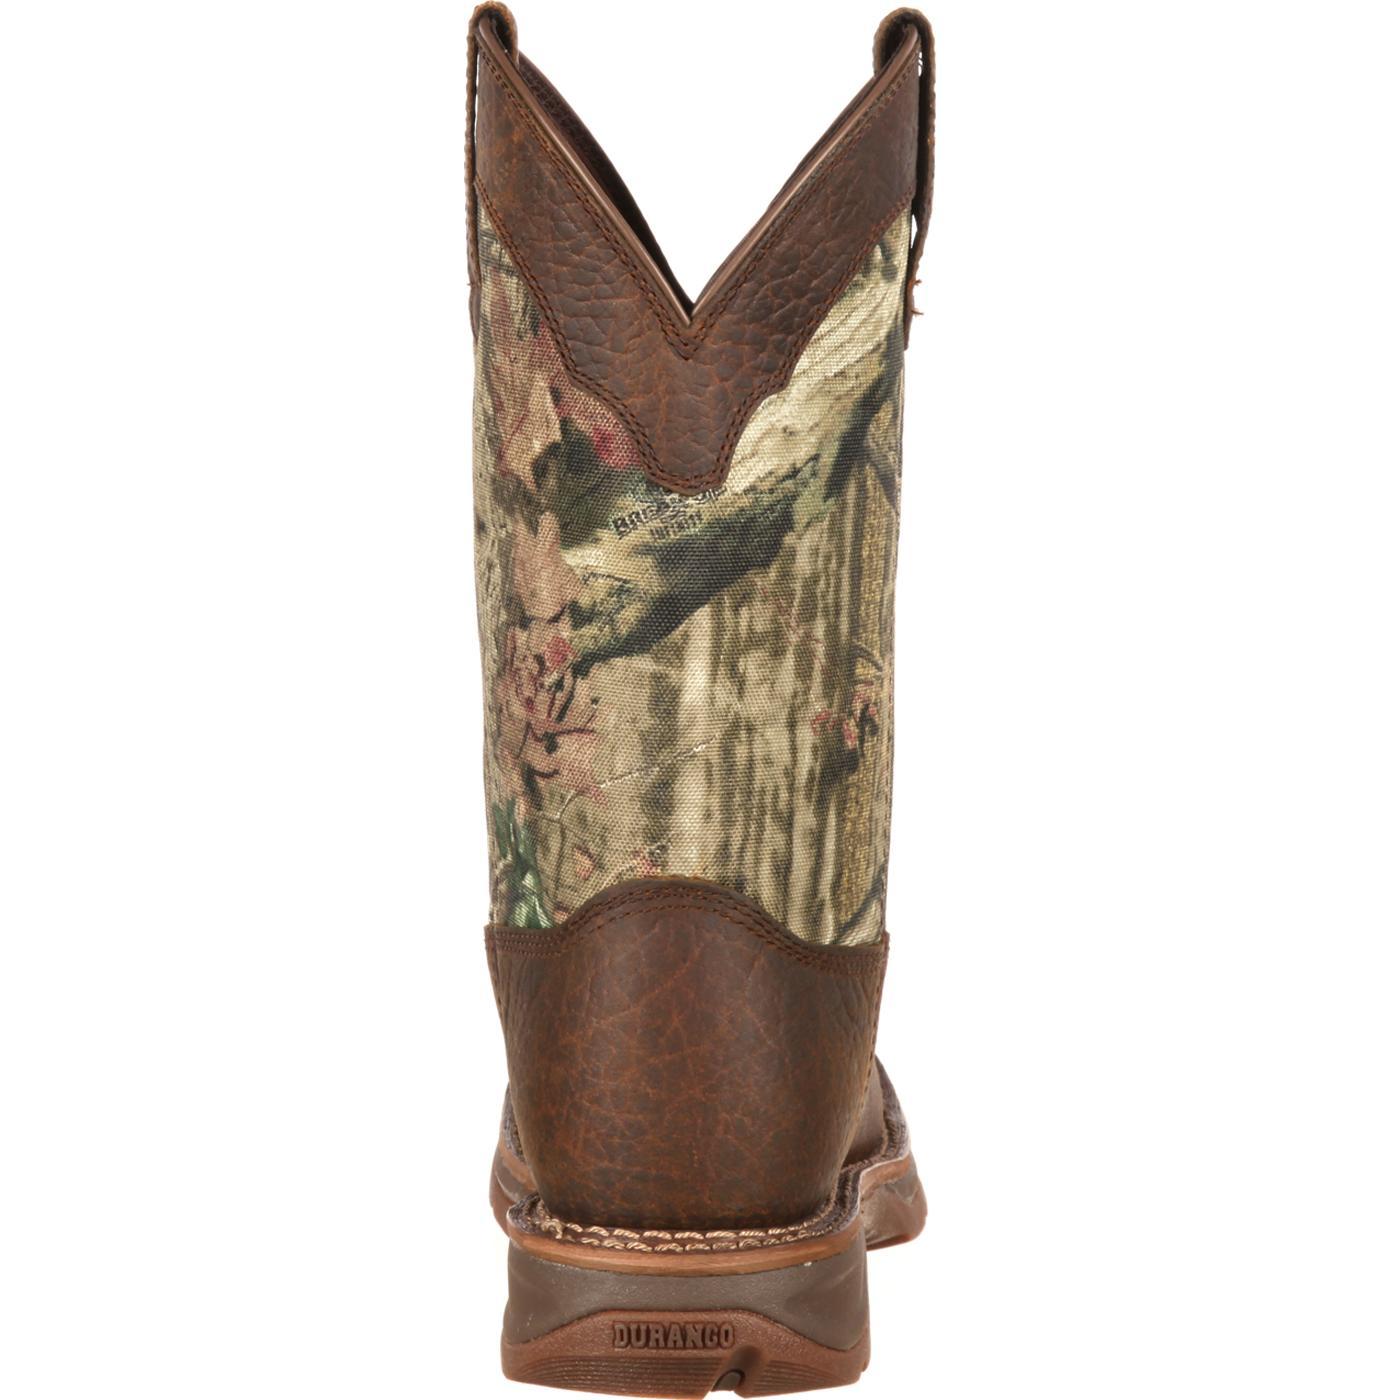 Country master bathroom ideas - Camo Cowboy Boots For Men Workin Rebel By Durango Men S Mossy Oak